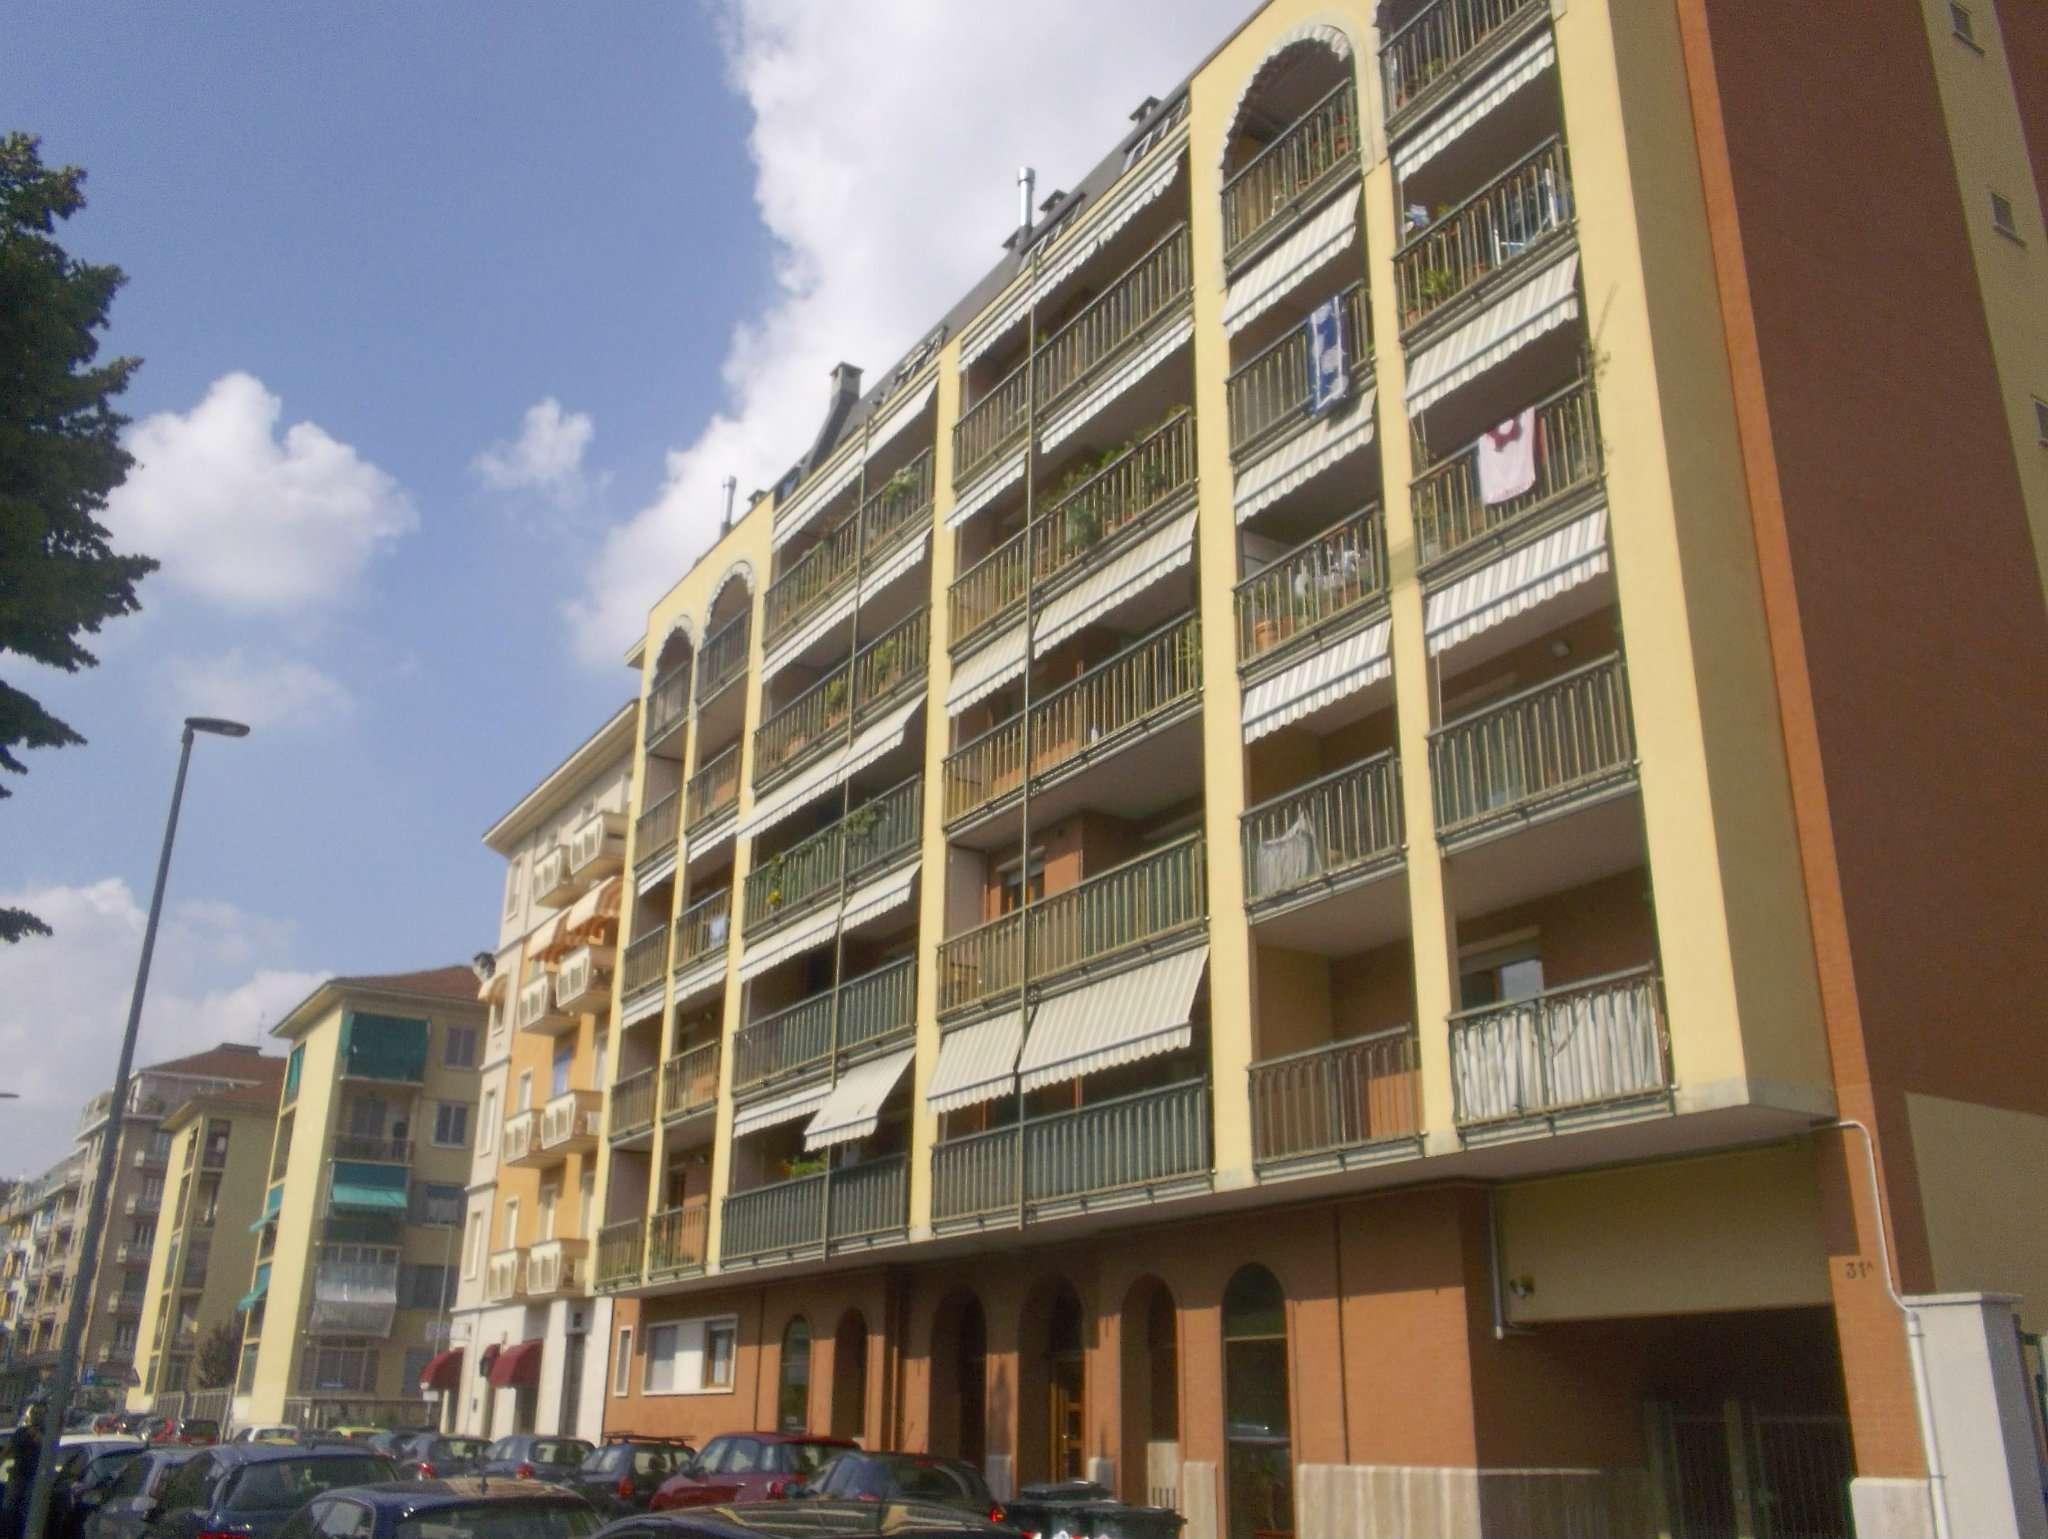 Bilocale Torino Via Baiardi 1